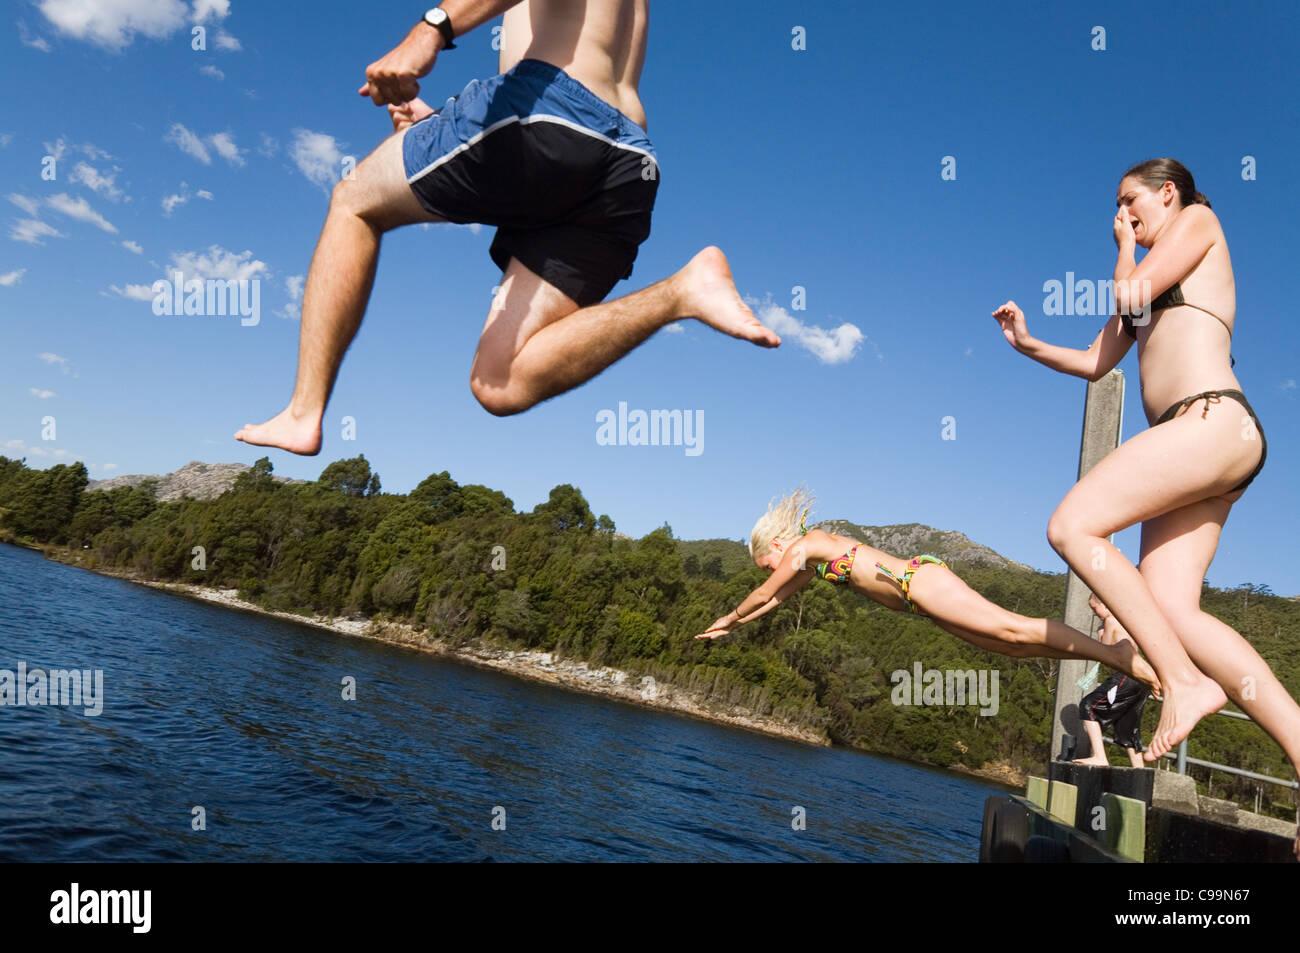 A group jumping off a pier into a lake. Lake Rosebery, Tullah, Tasmania, Australia Stock Photo